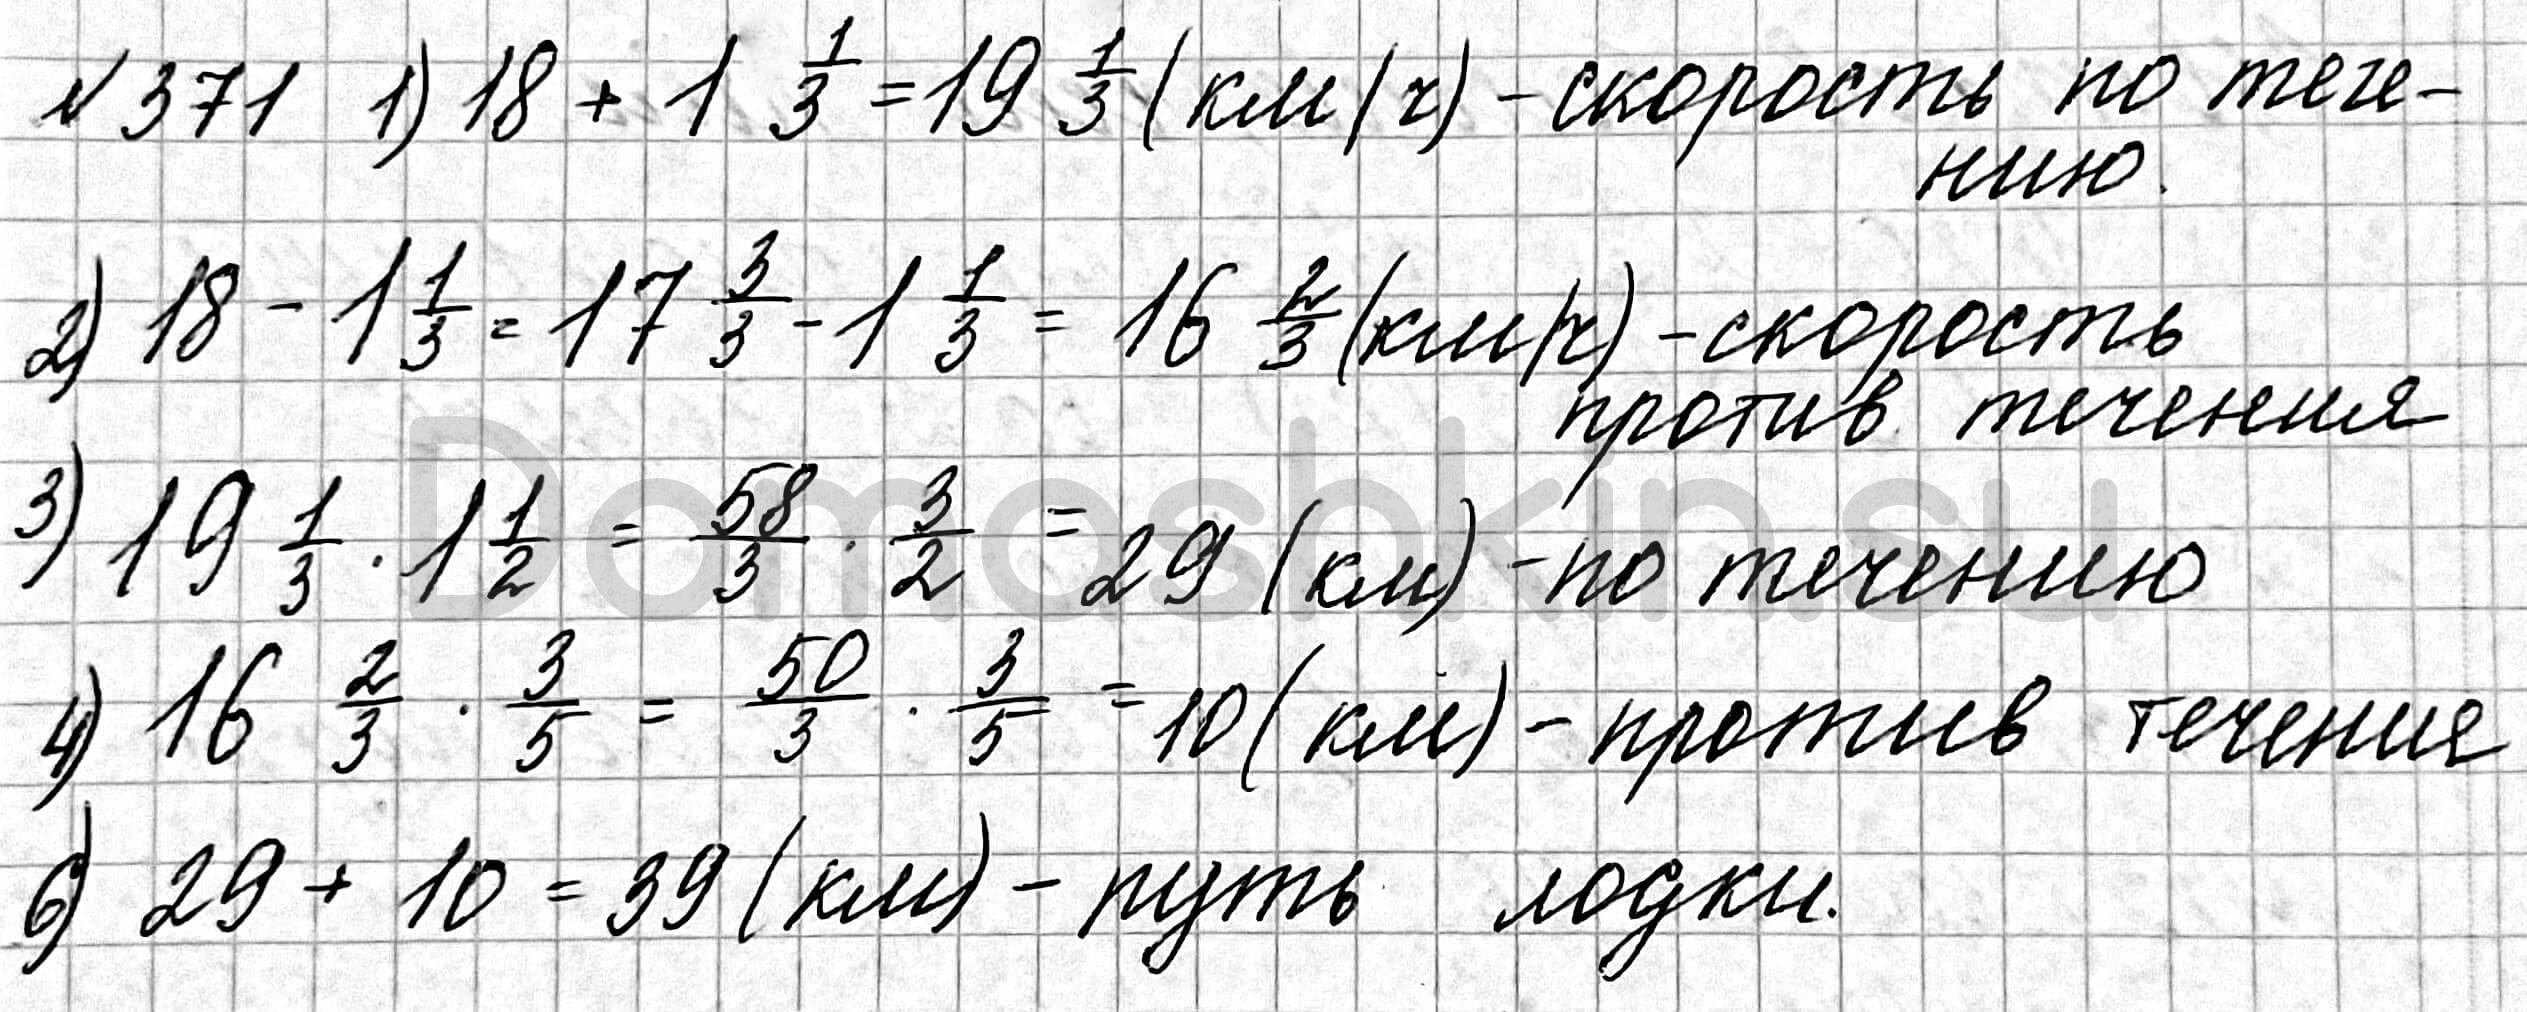 Математика 6 класс учебник Мерзляк номер 371 решение